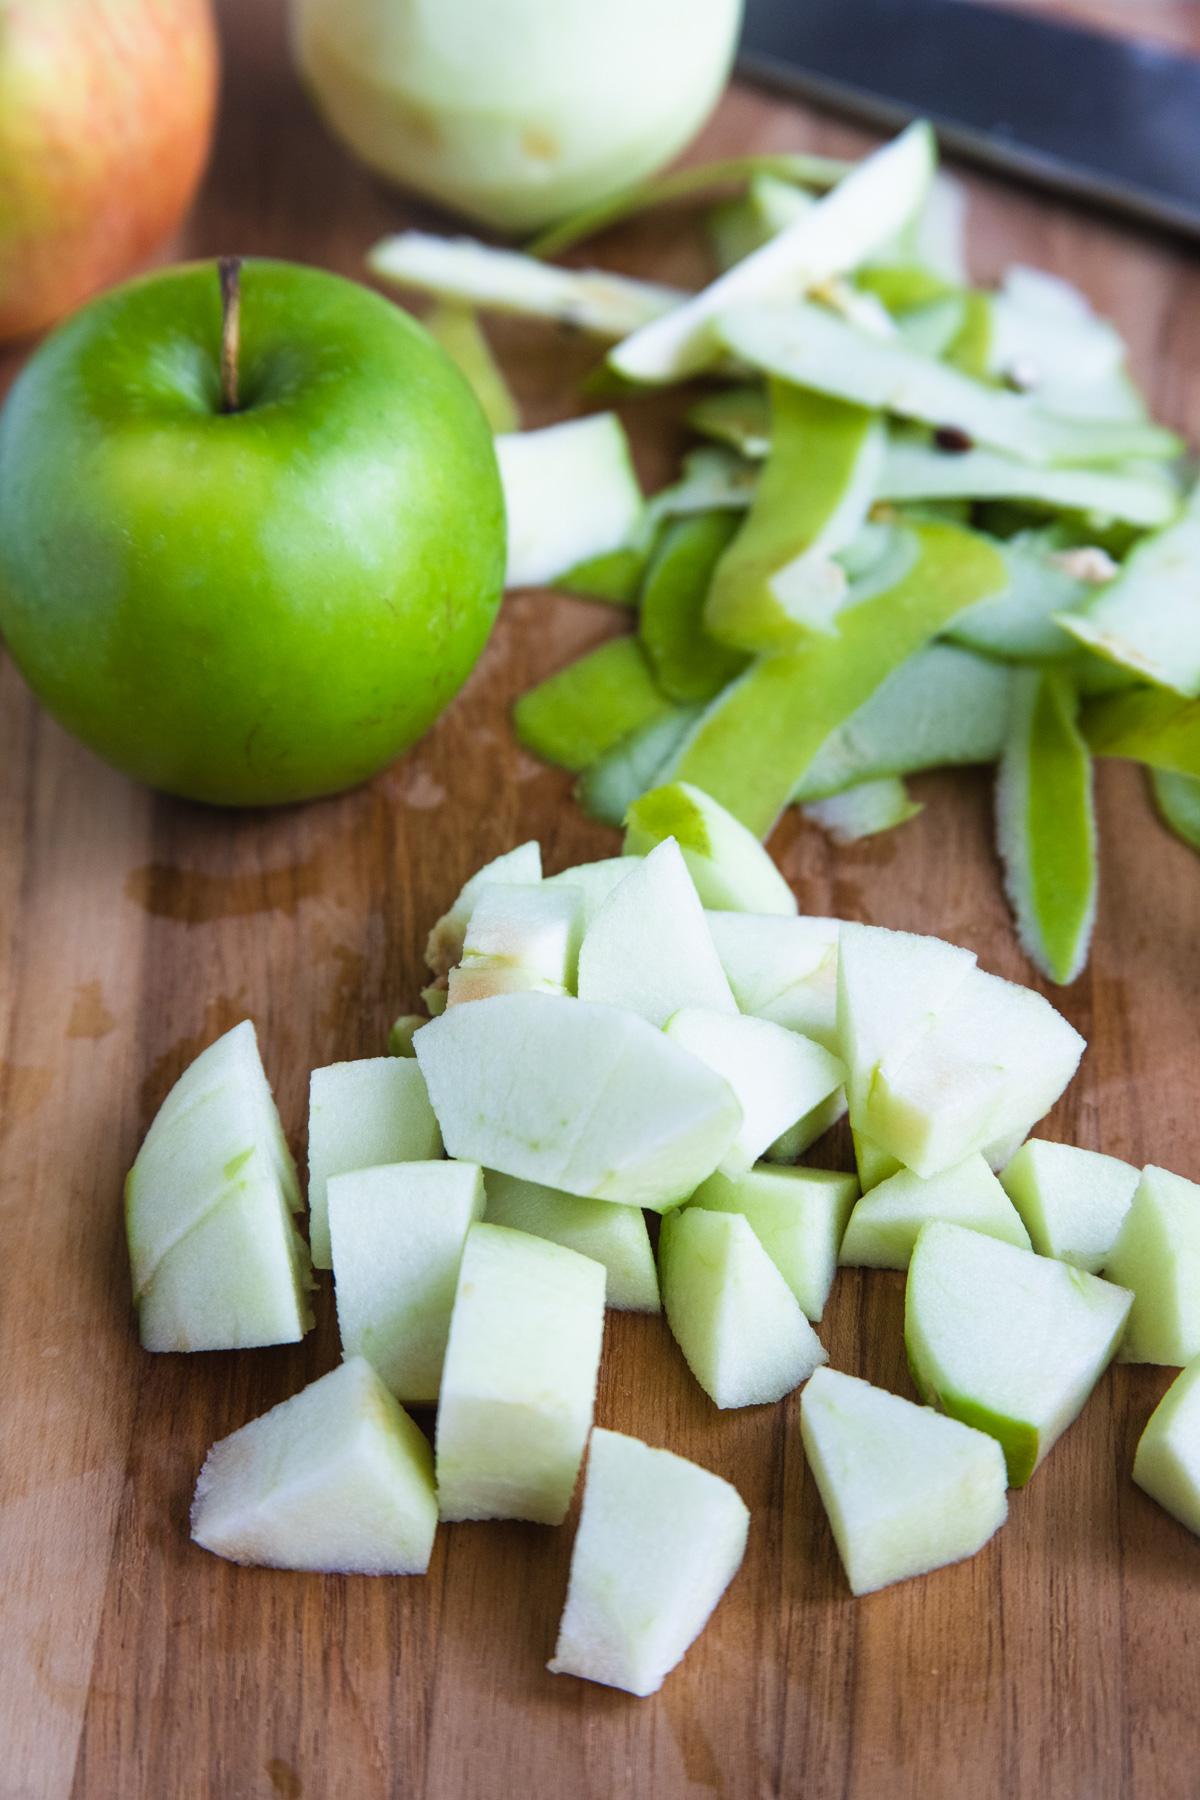 Granny Smith Apple on a cutting board cut into 1-inch chunks